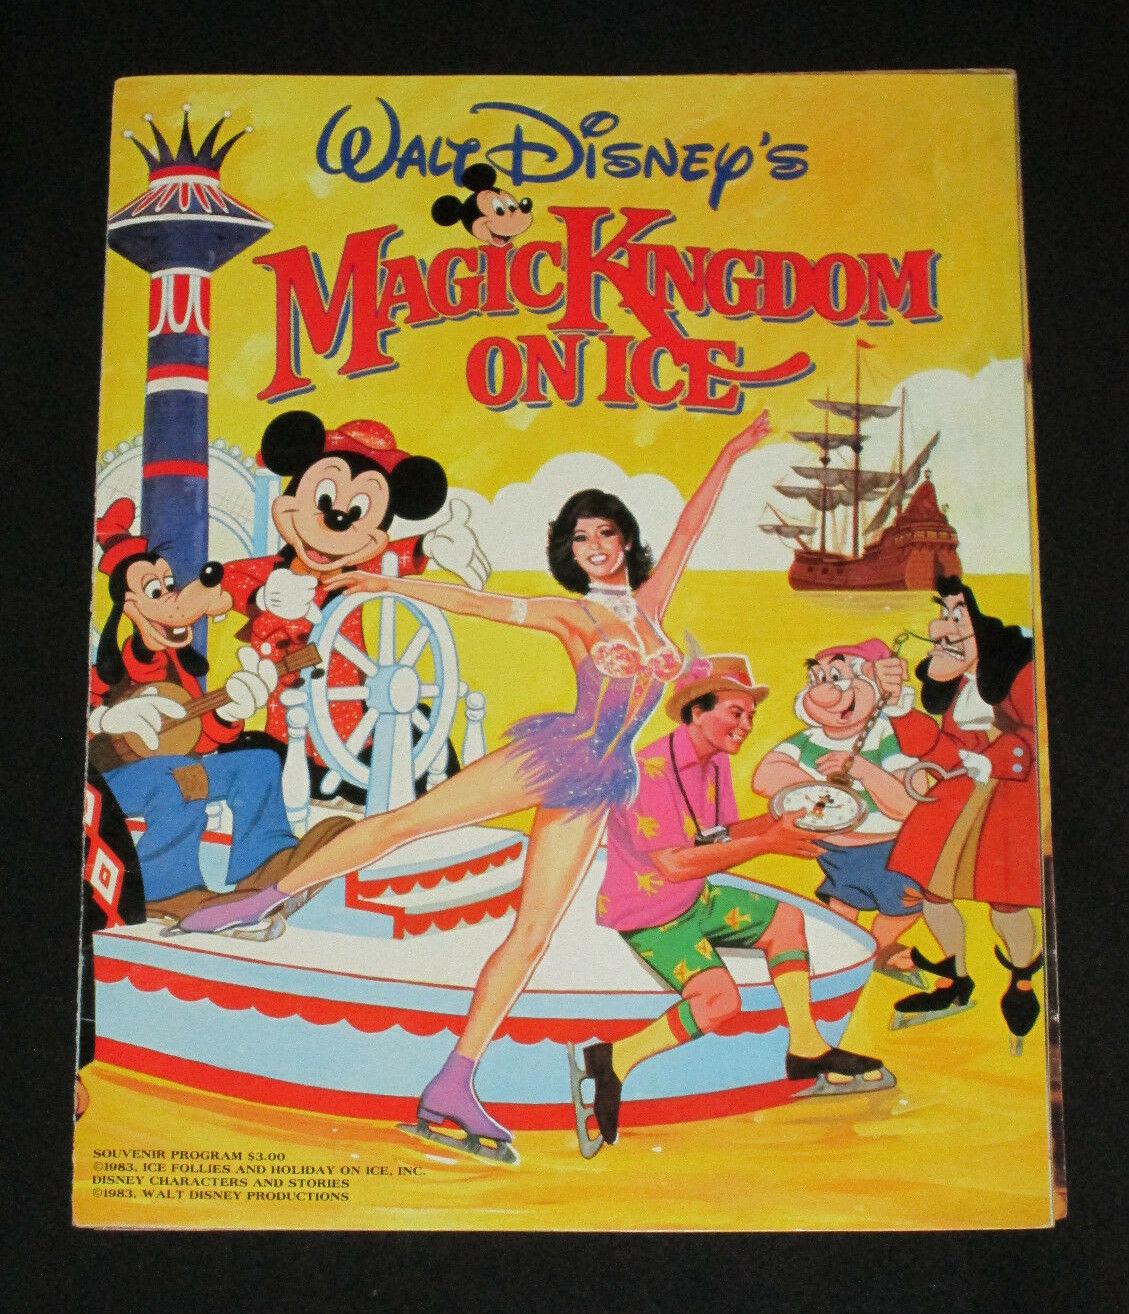 Magic Kingdom on Ice program